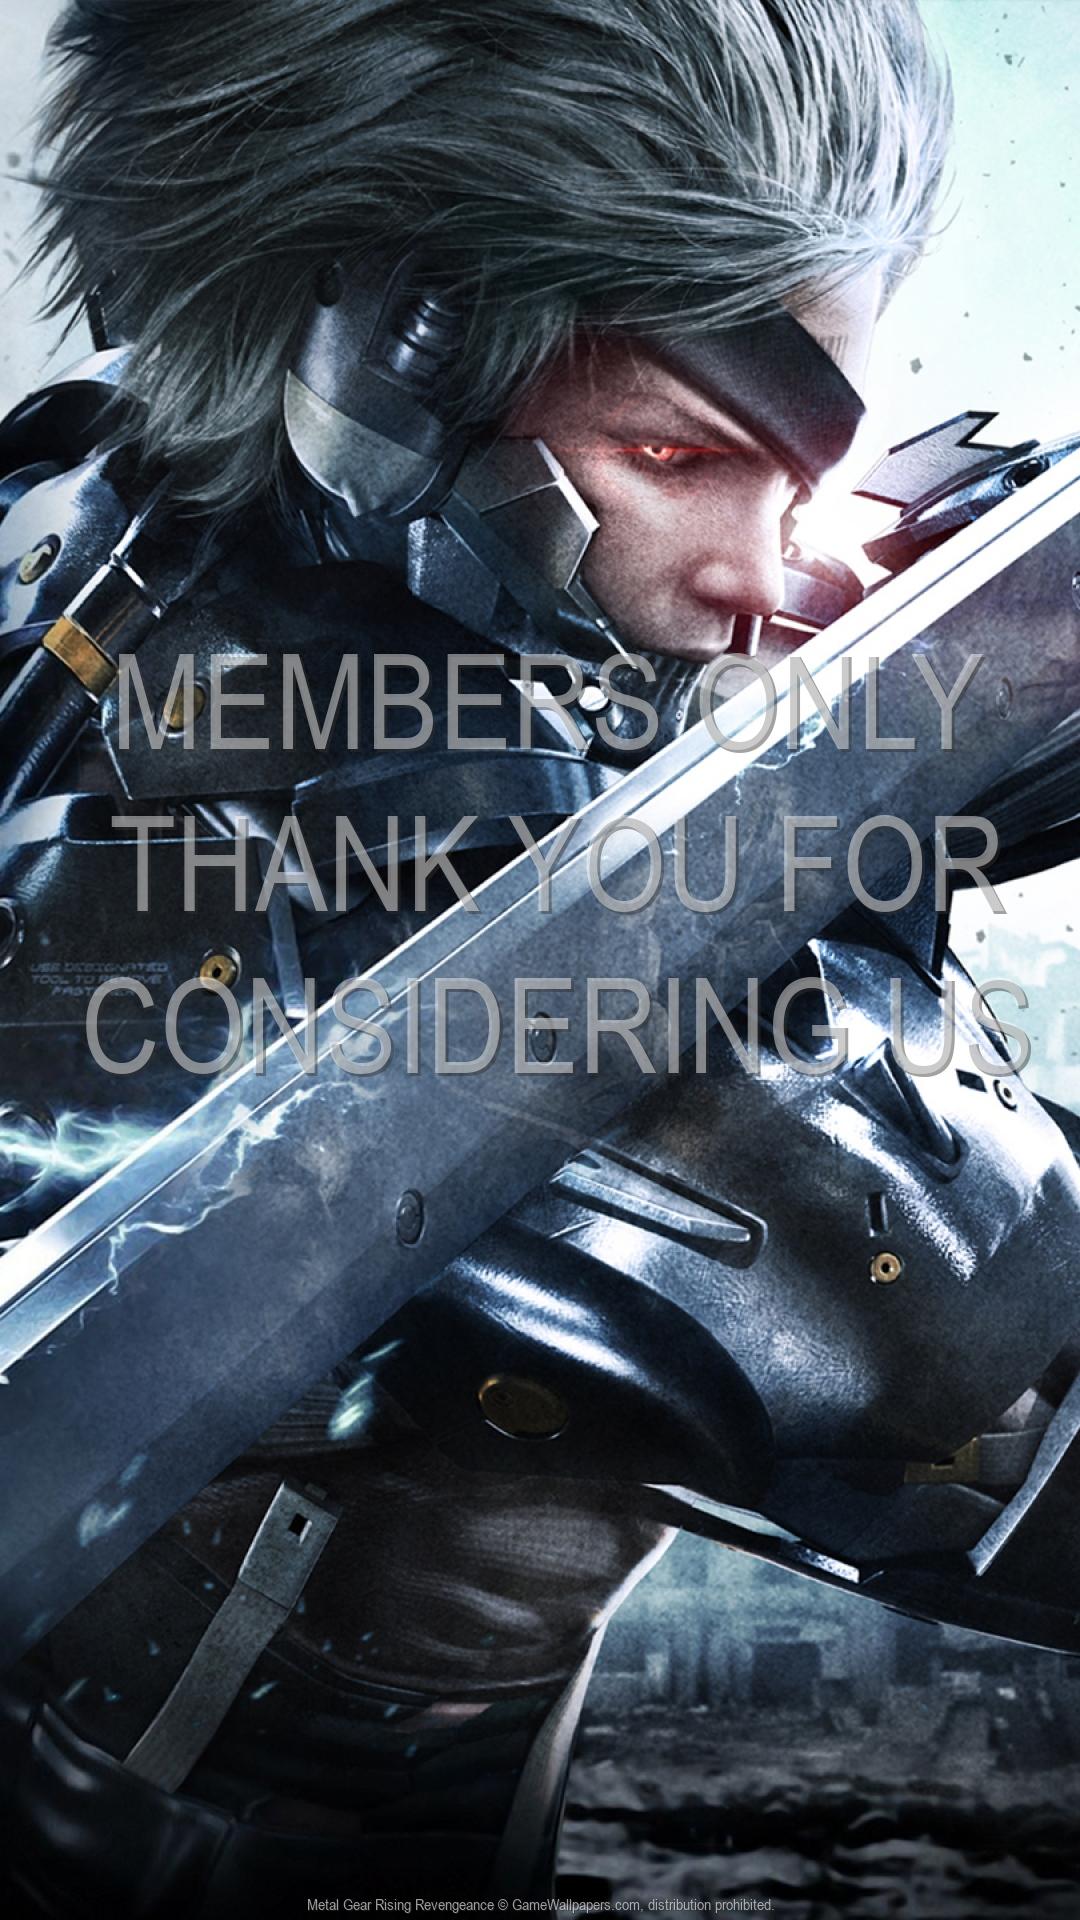 Metal Gear Rising Revengeance Wallpaper 04 1920x1080